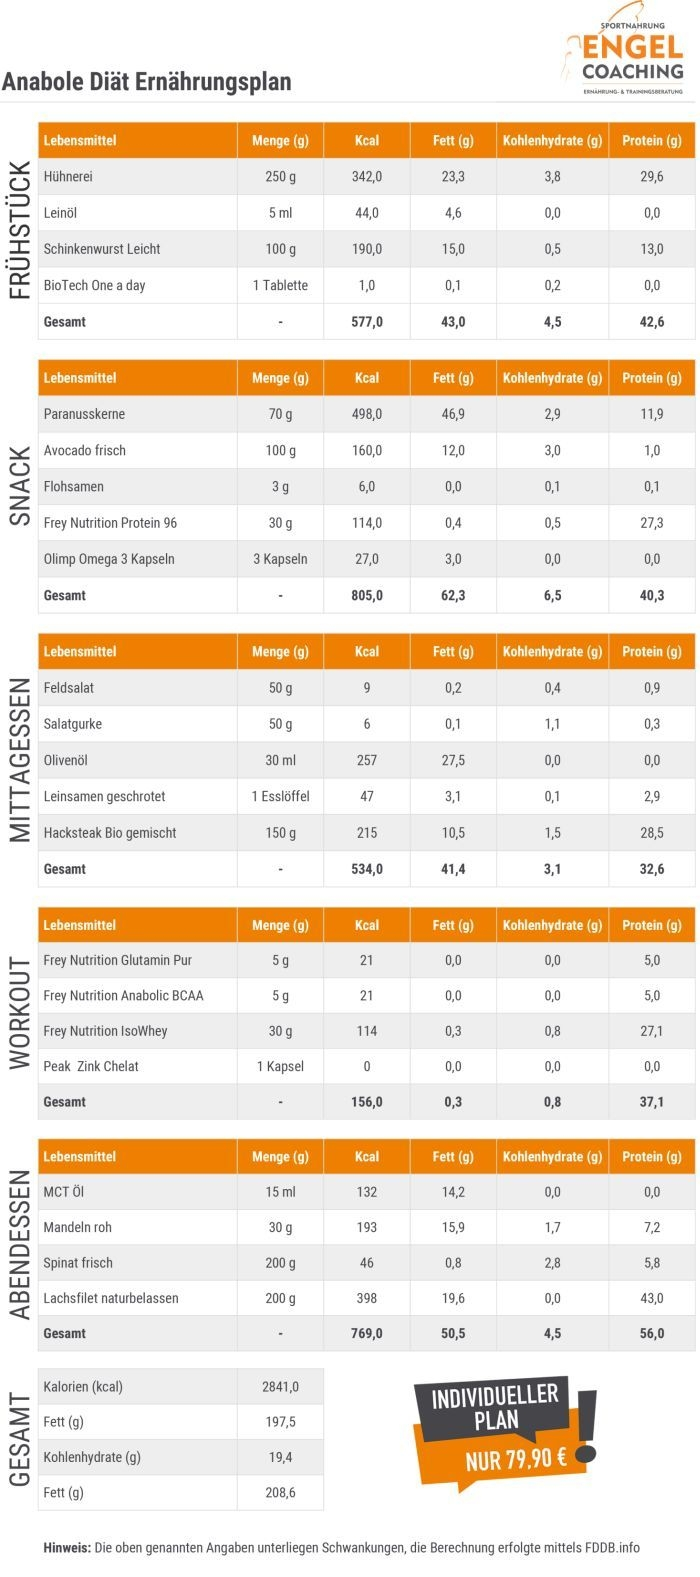 Anabole Diät Ernährungsplan optimale Fettverbrennung bei maximalen Muskelerhalt